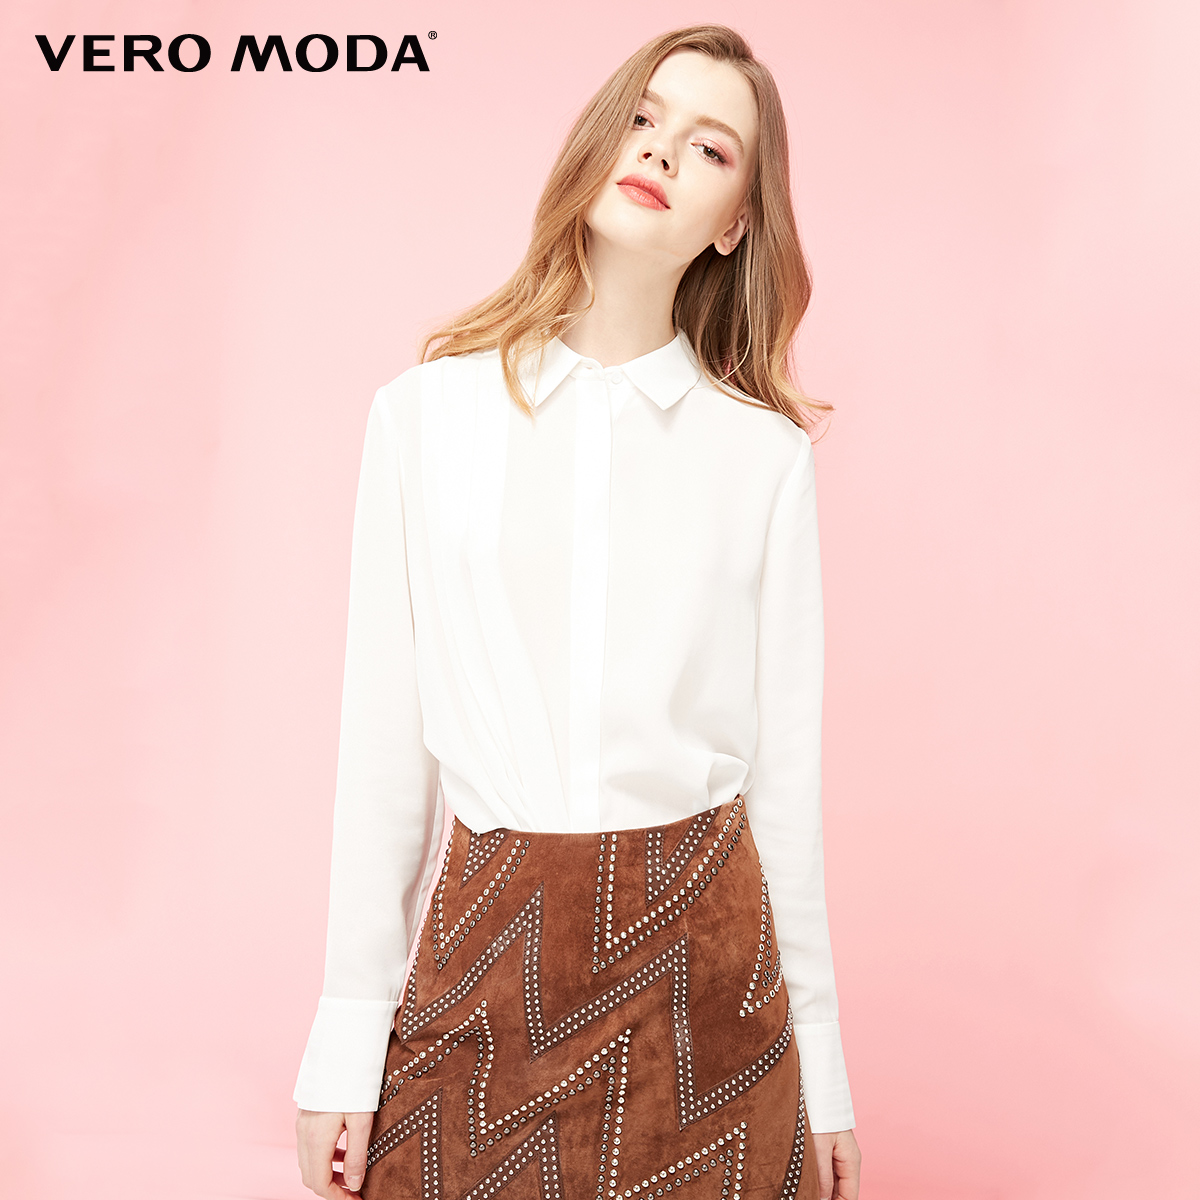 Vero Moda Women's OL Style Spliced Fabric Pleated Shirt | 319131508